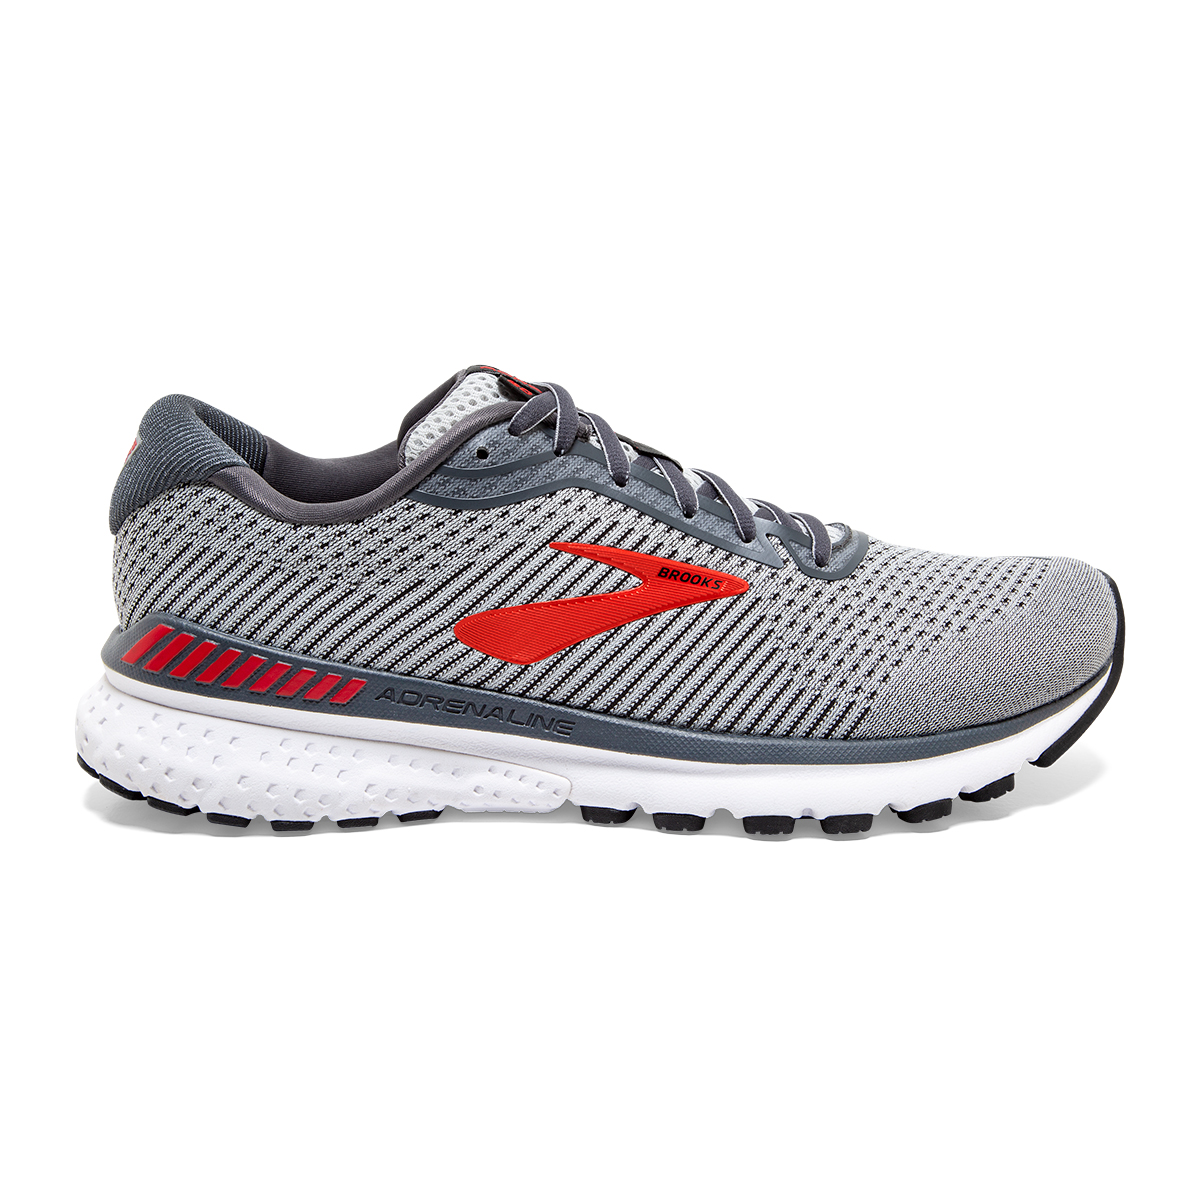 Men's Brooks Adrenaline GTS 20 Running Shoe - Color: Grey/Ebony/Red - Size: 7 - Width: Regular, Grey/Ebony/Red, large, image 1